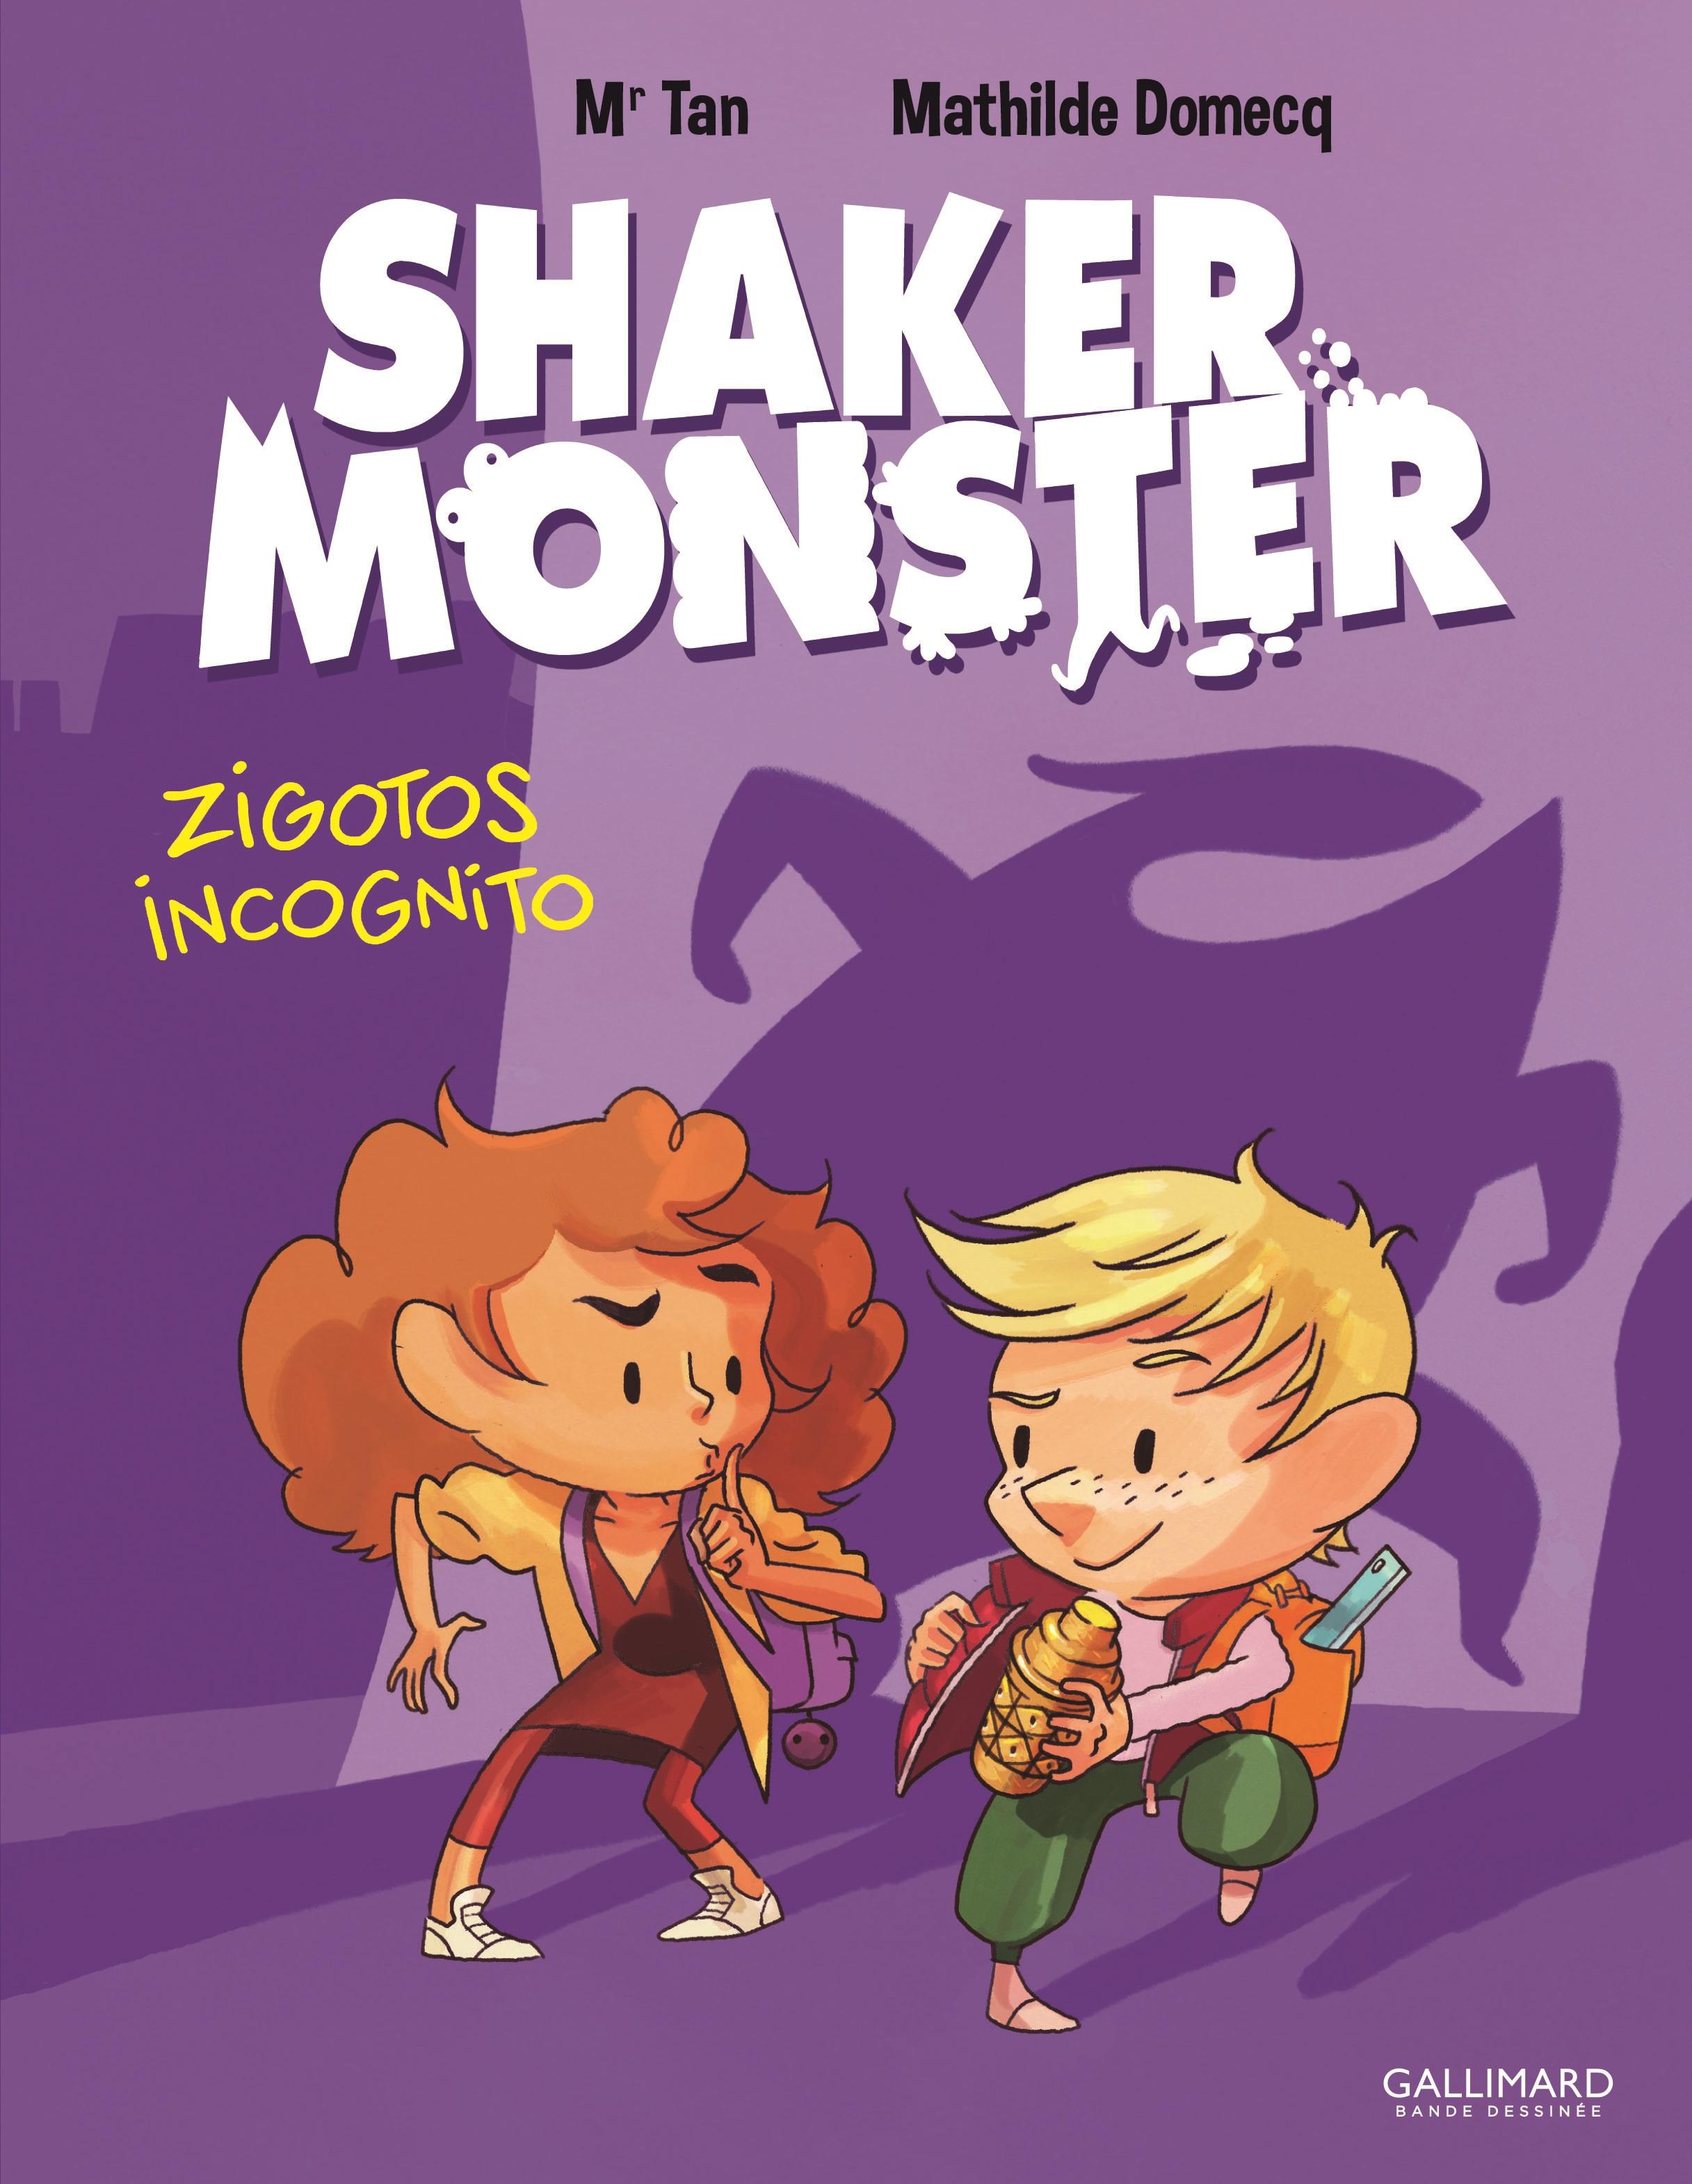 Shaker Monster (Tome 2) - Zigotos incognito